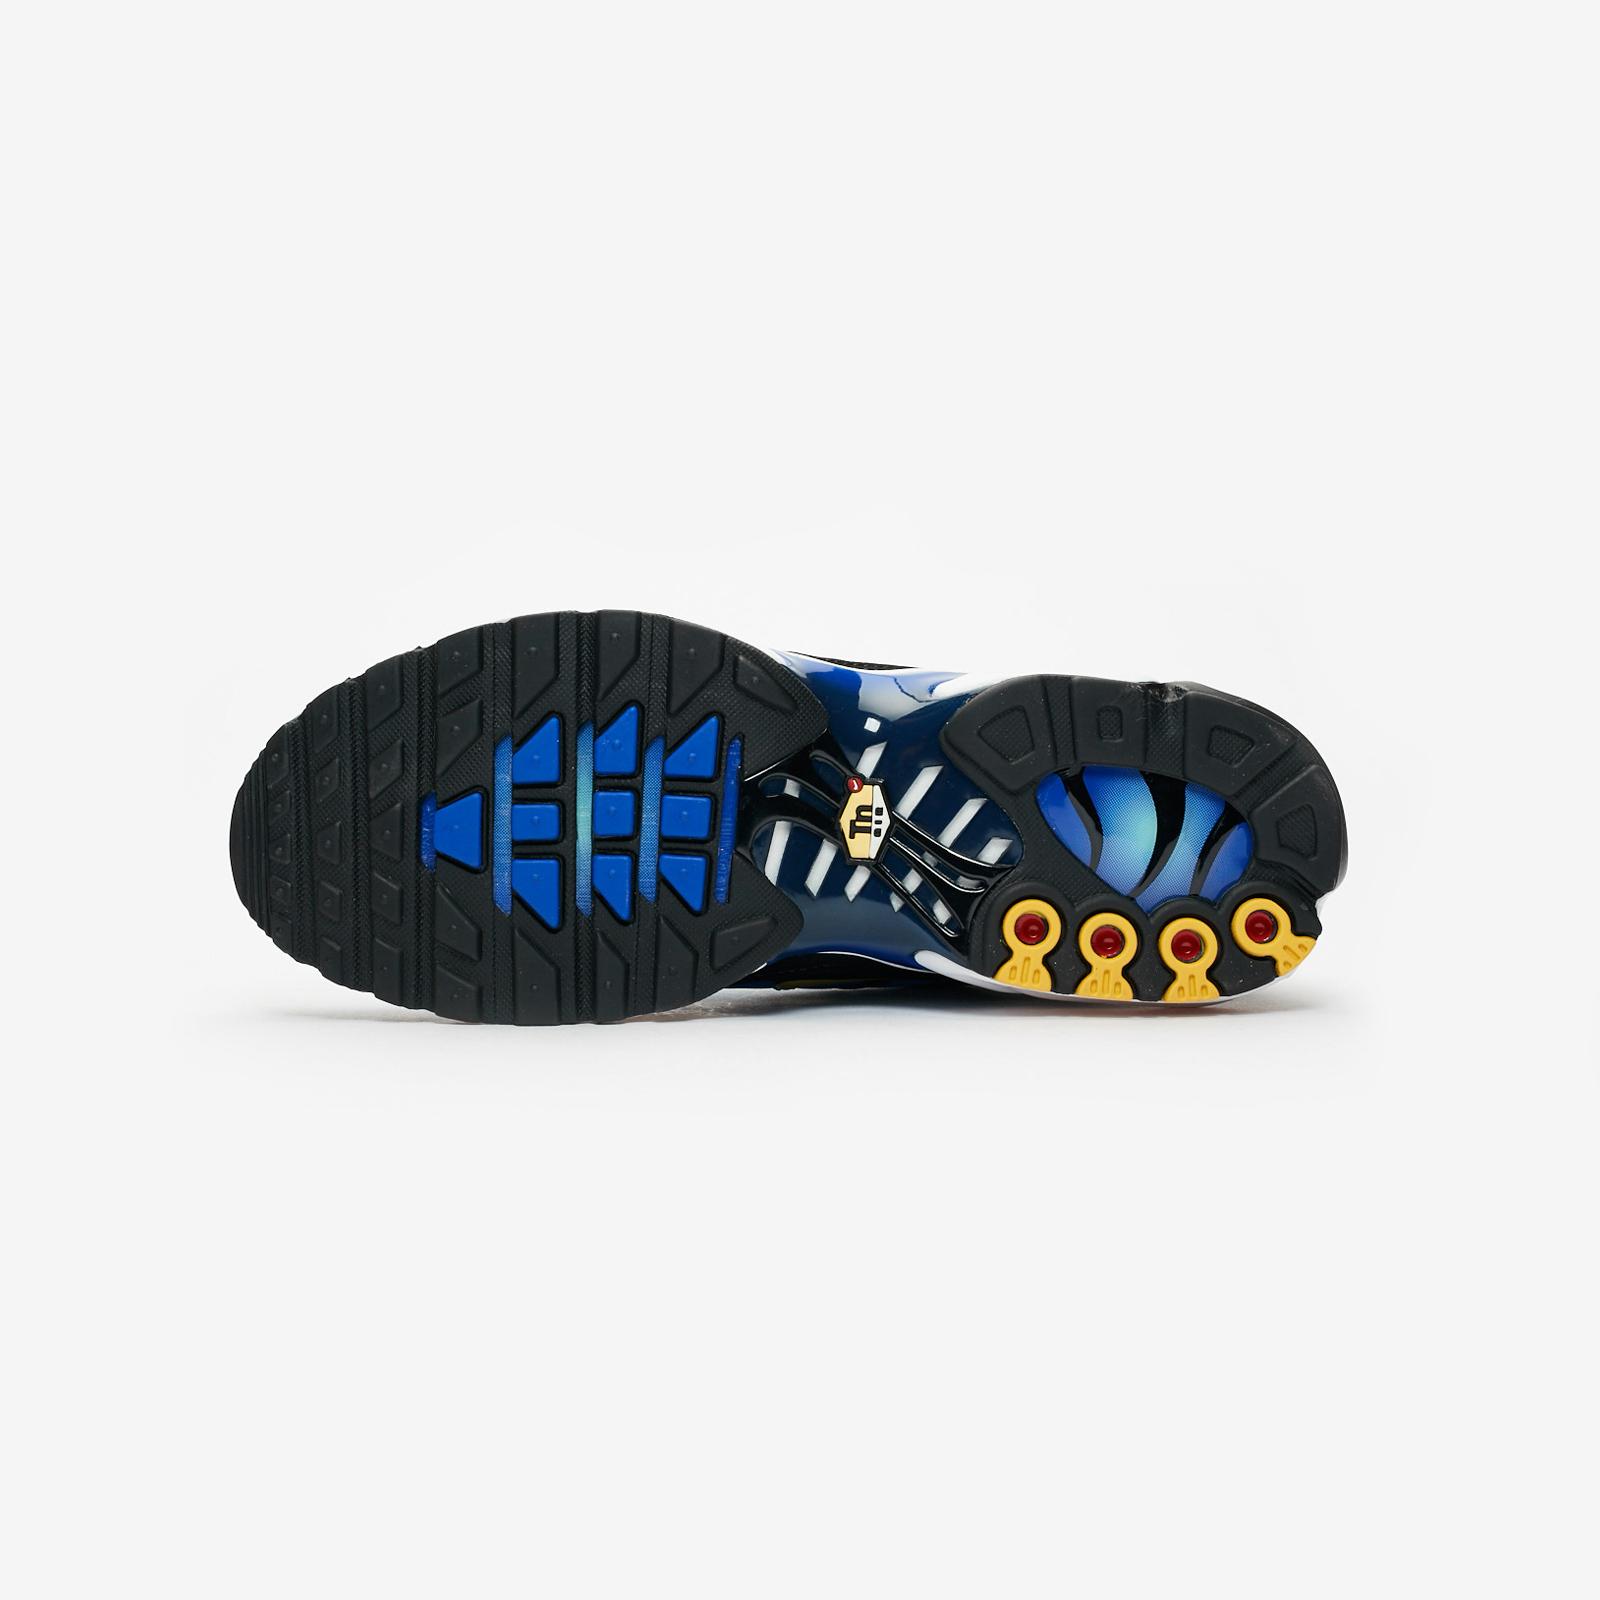 the latest 2fa96 26d65 Nike Air Max Plus OG - Bq4629-003 - Sneakersnstuff   sneakers   streetwear  online since 1999